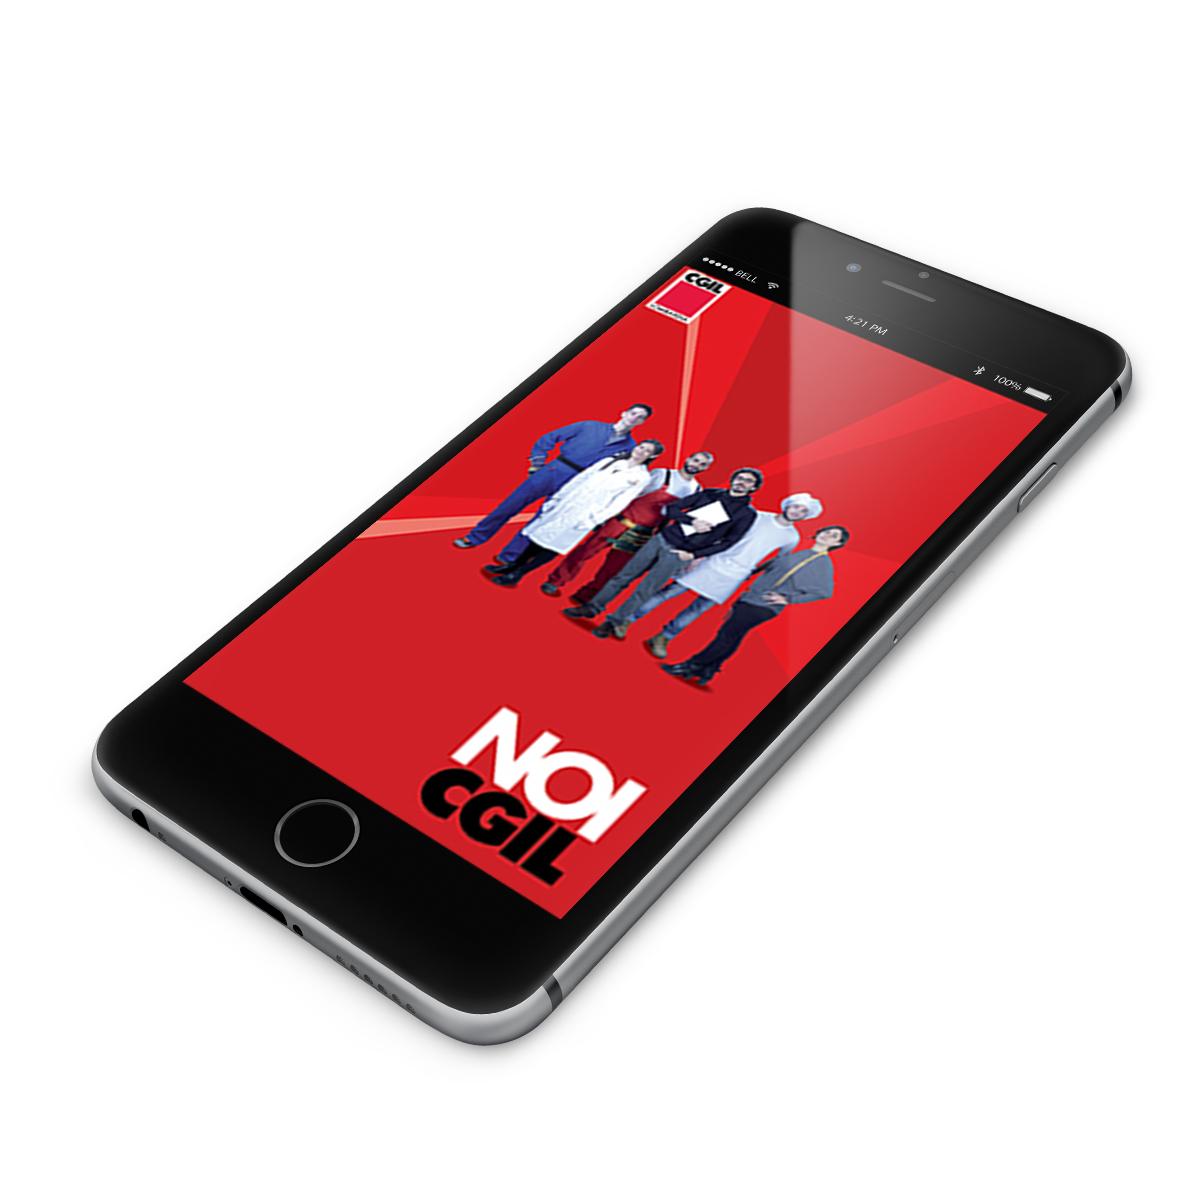 Cgil Lombardia: app mobile